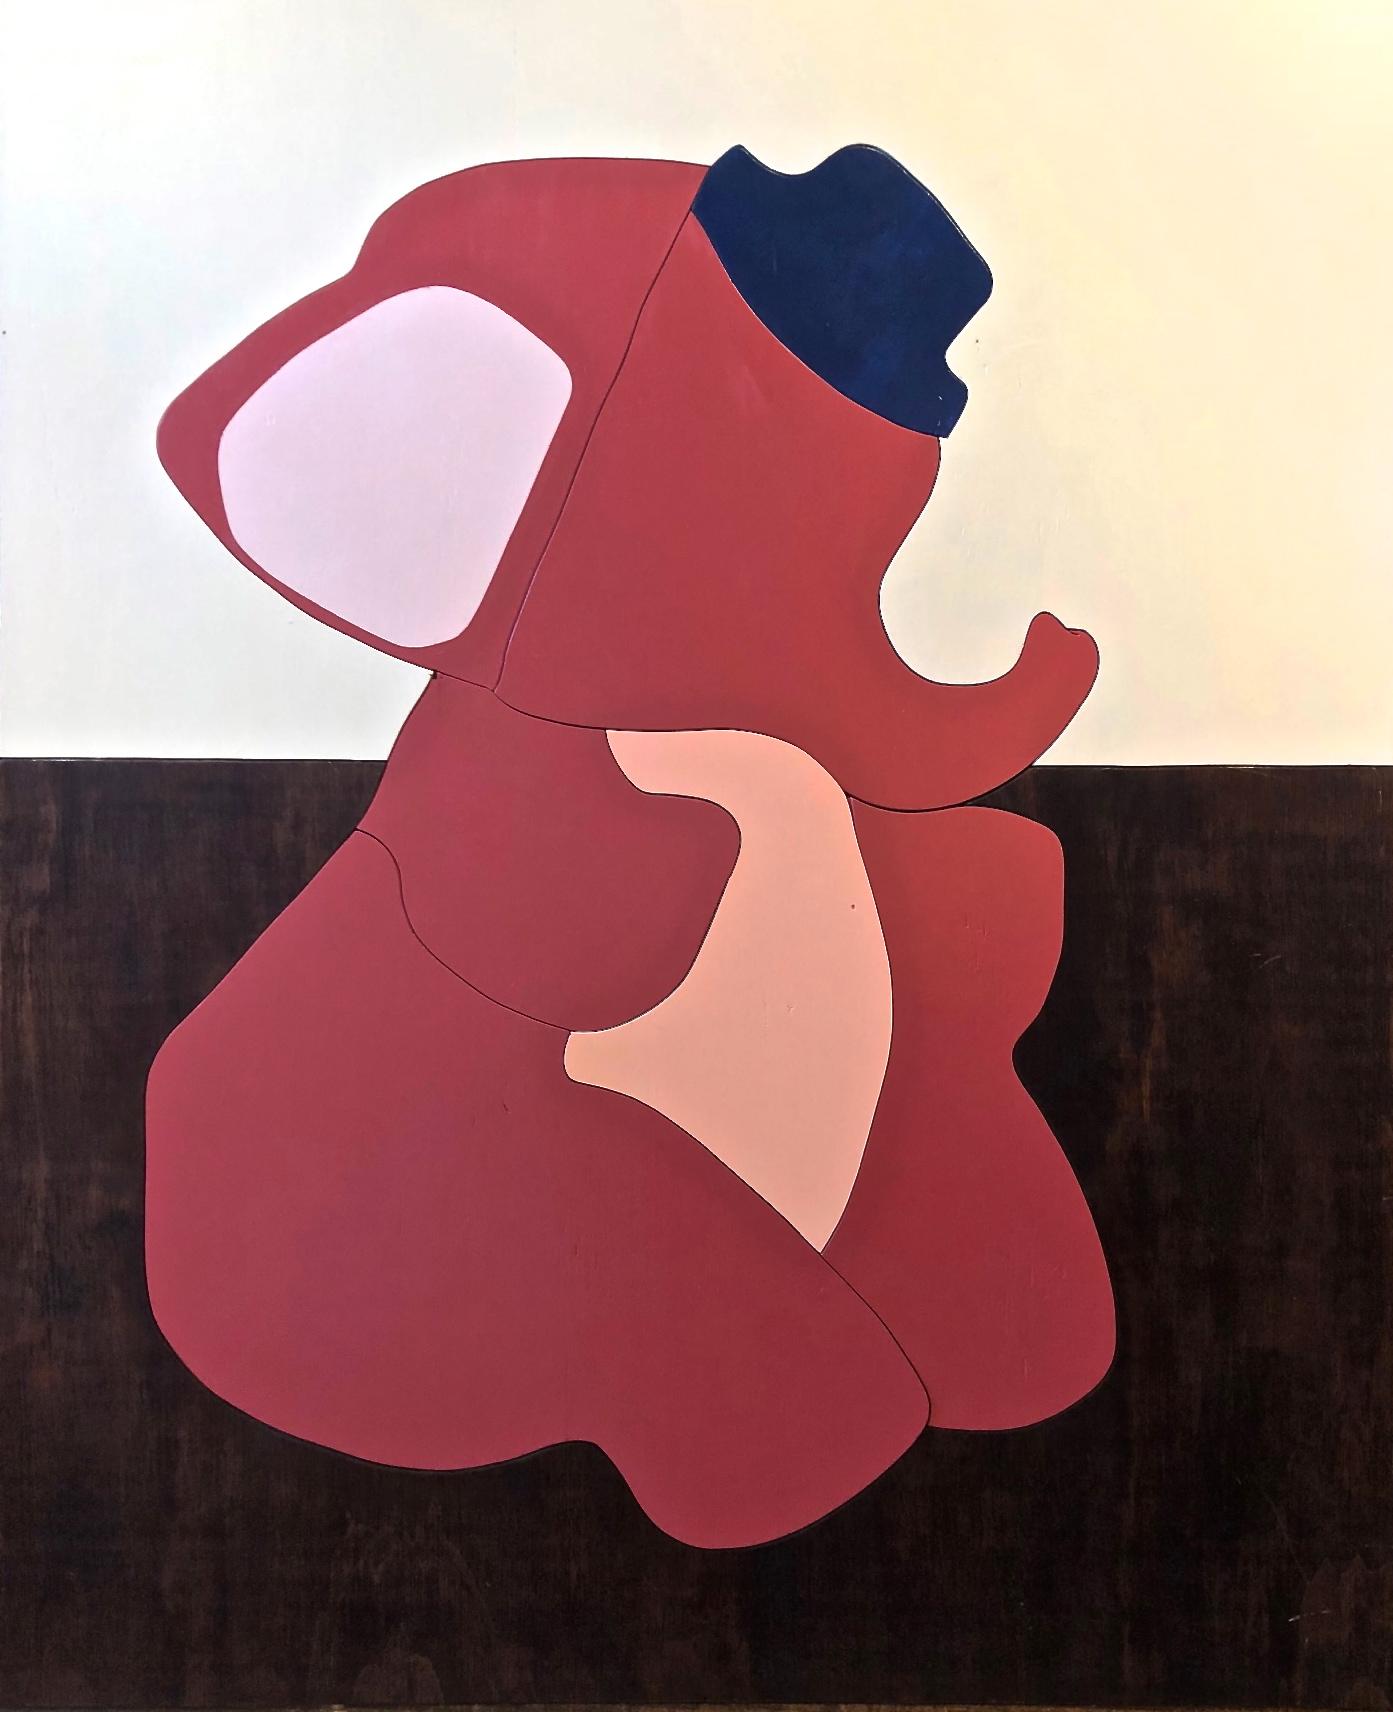 Elephant - Michael Larry Simpson - Latex paint on cut wood pieces - 49_ x 40_ - 2018 - 2,200.jpg